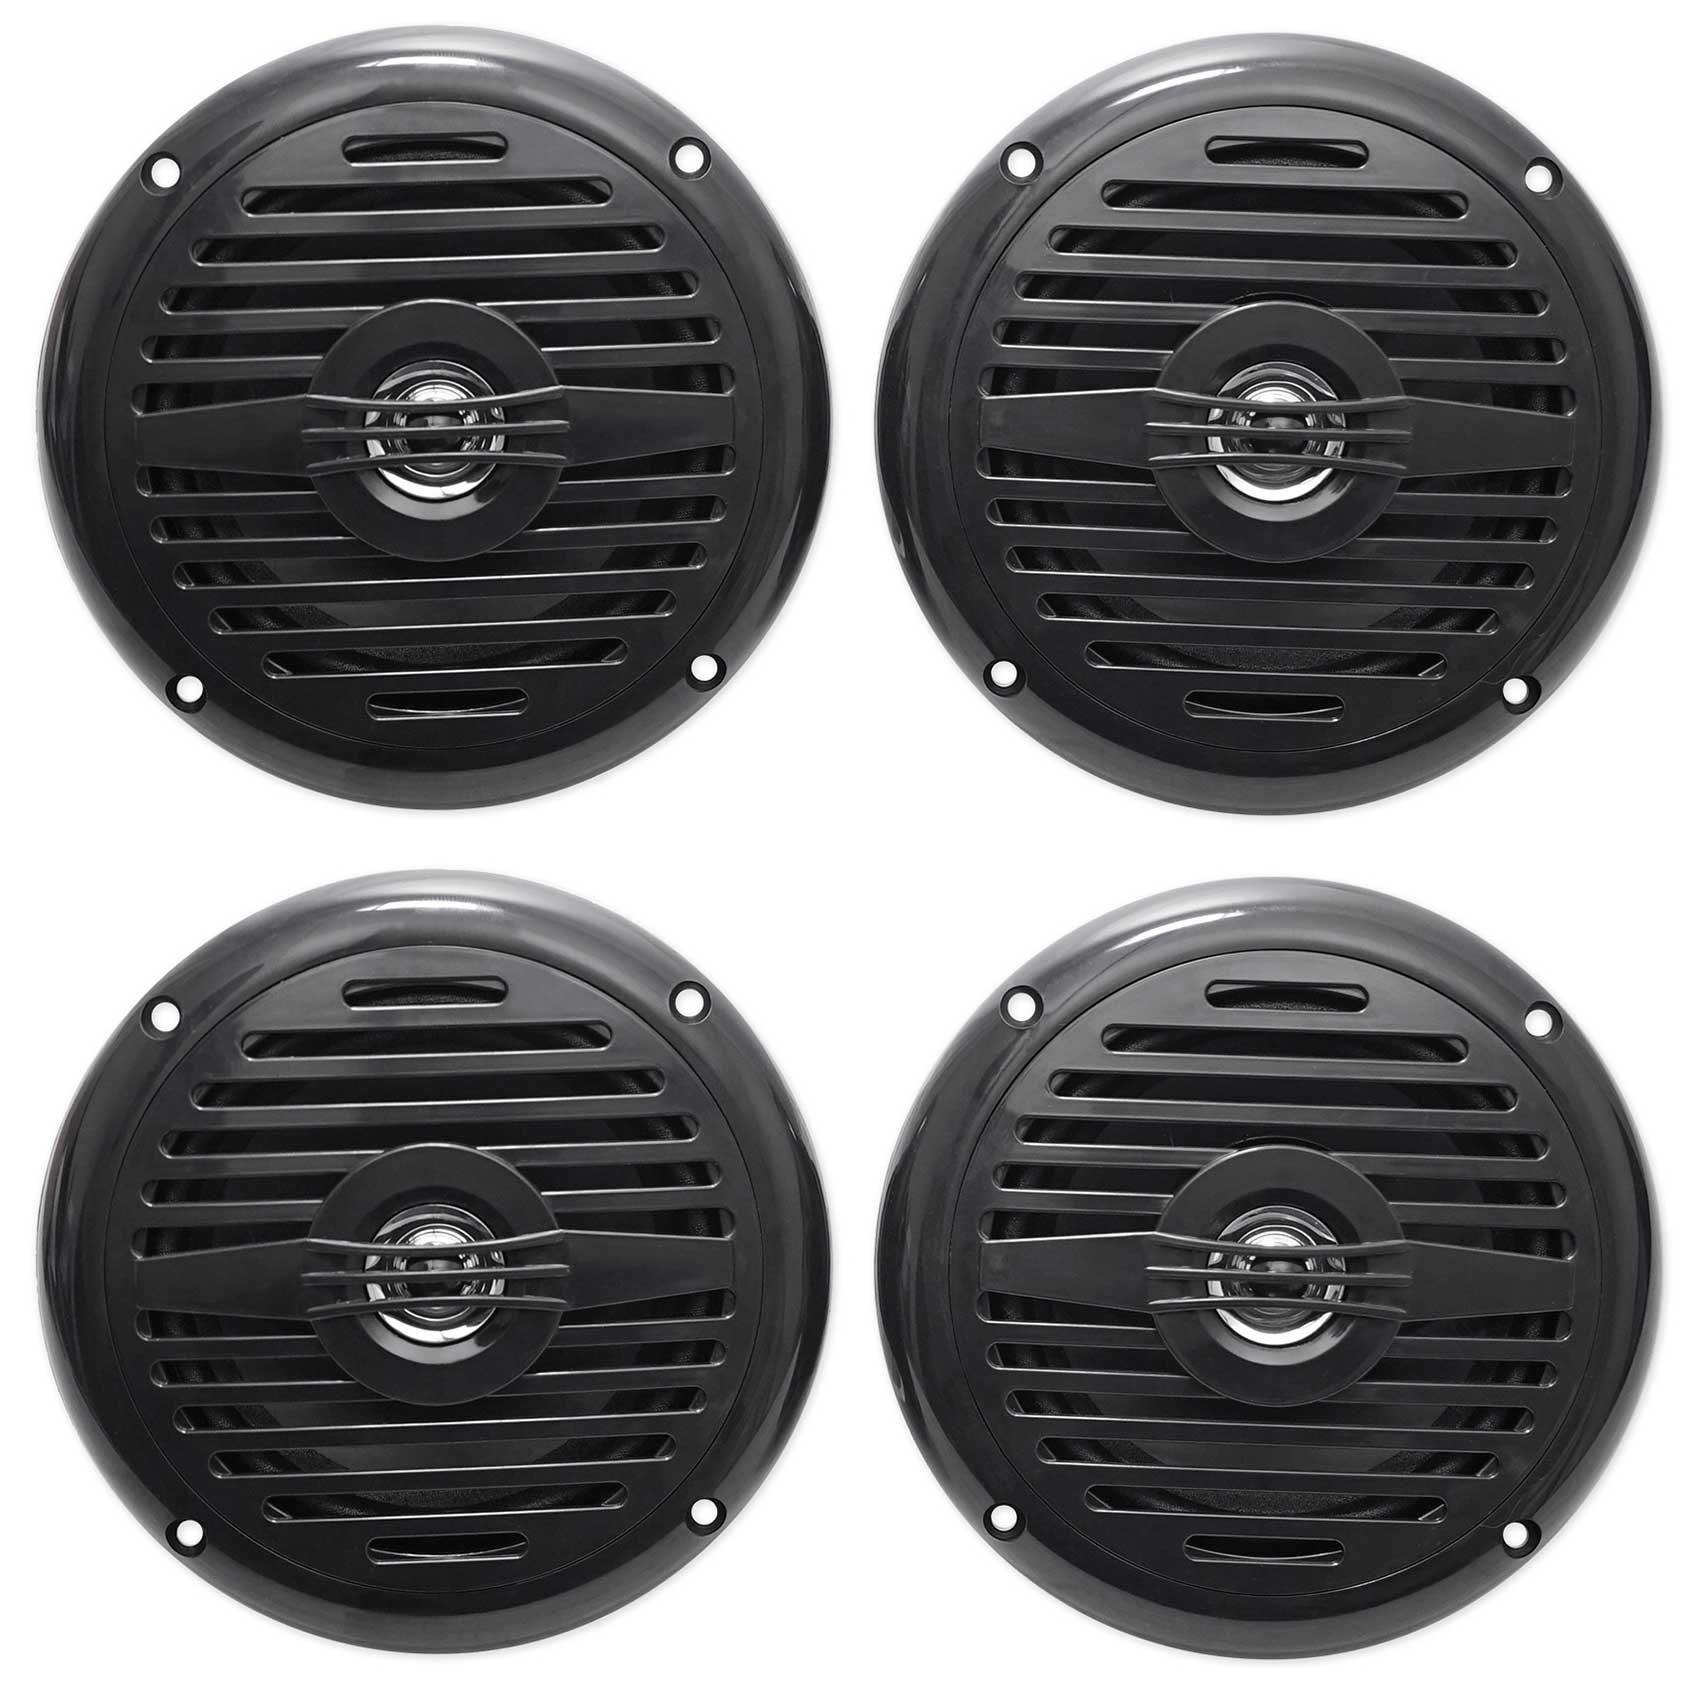 (4) Rockville MS525B 5.25'' 800 Watt Waterproof Marine Boat Speakers 2-Way Black